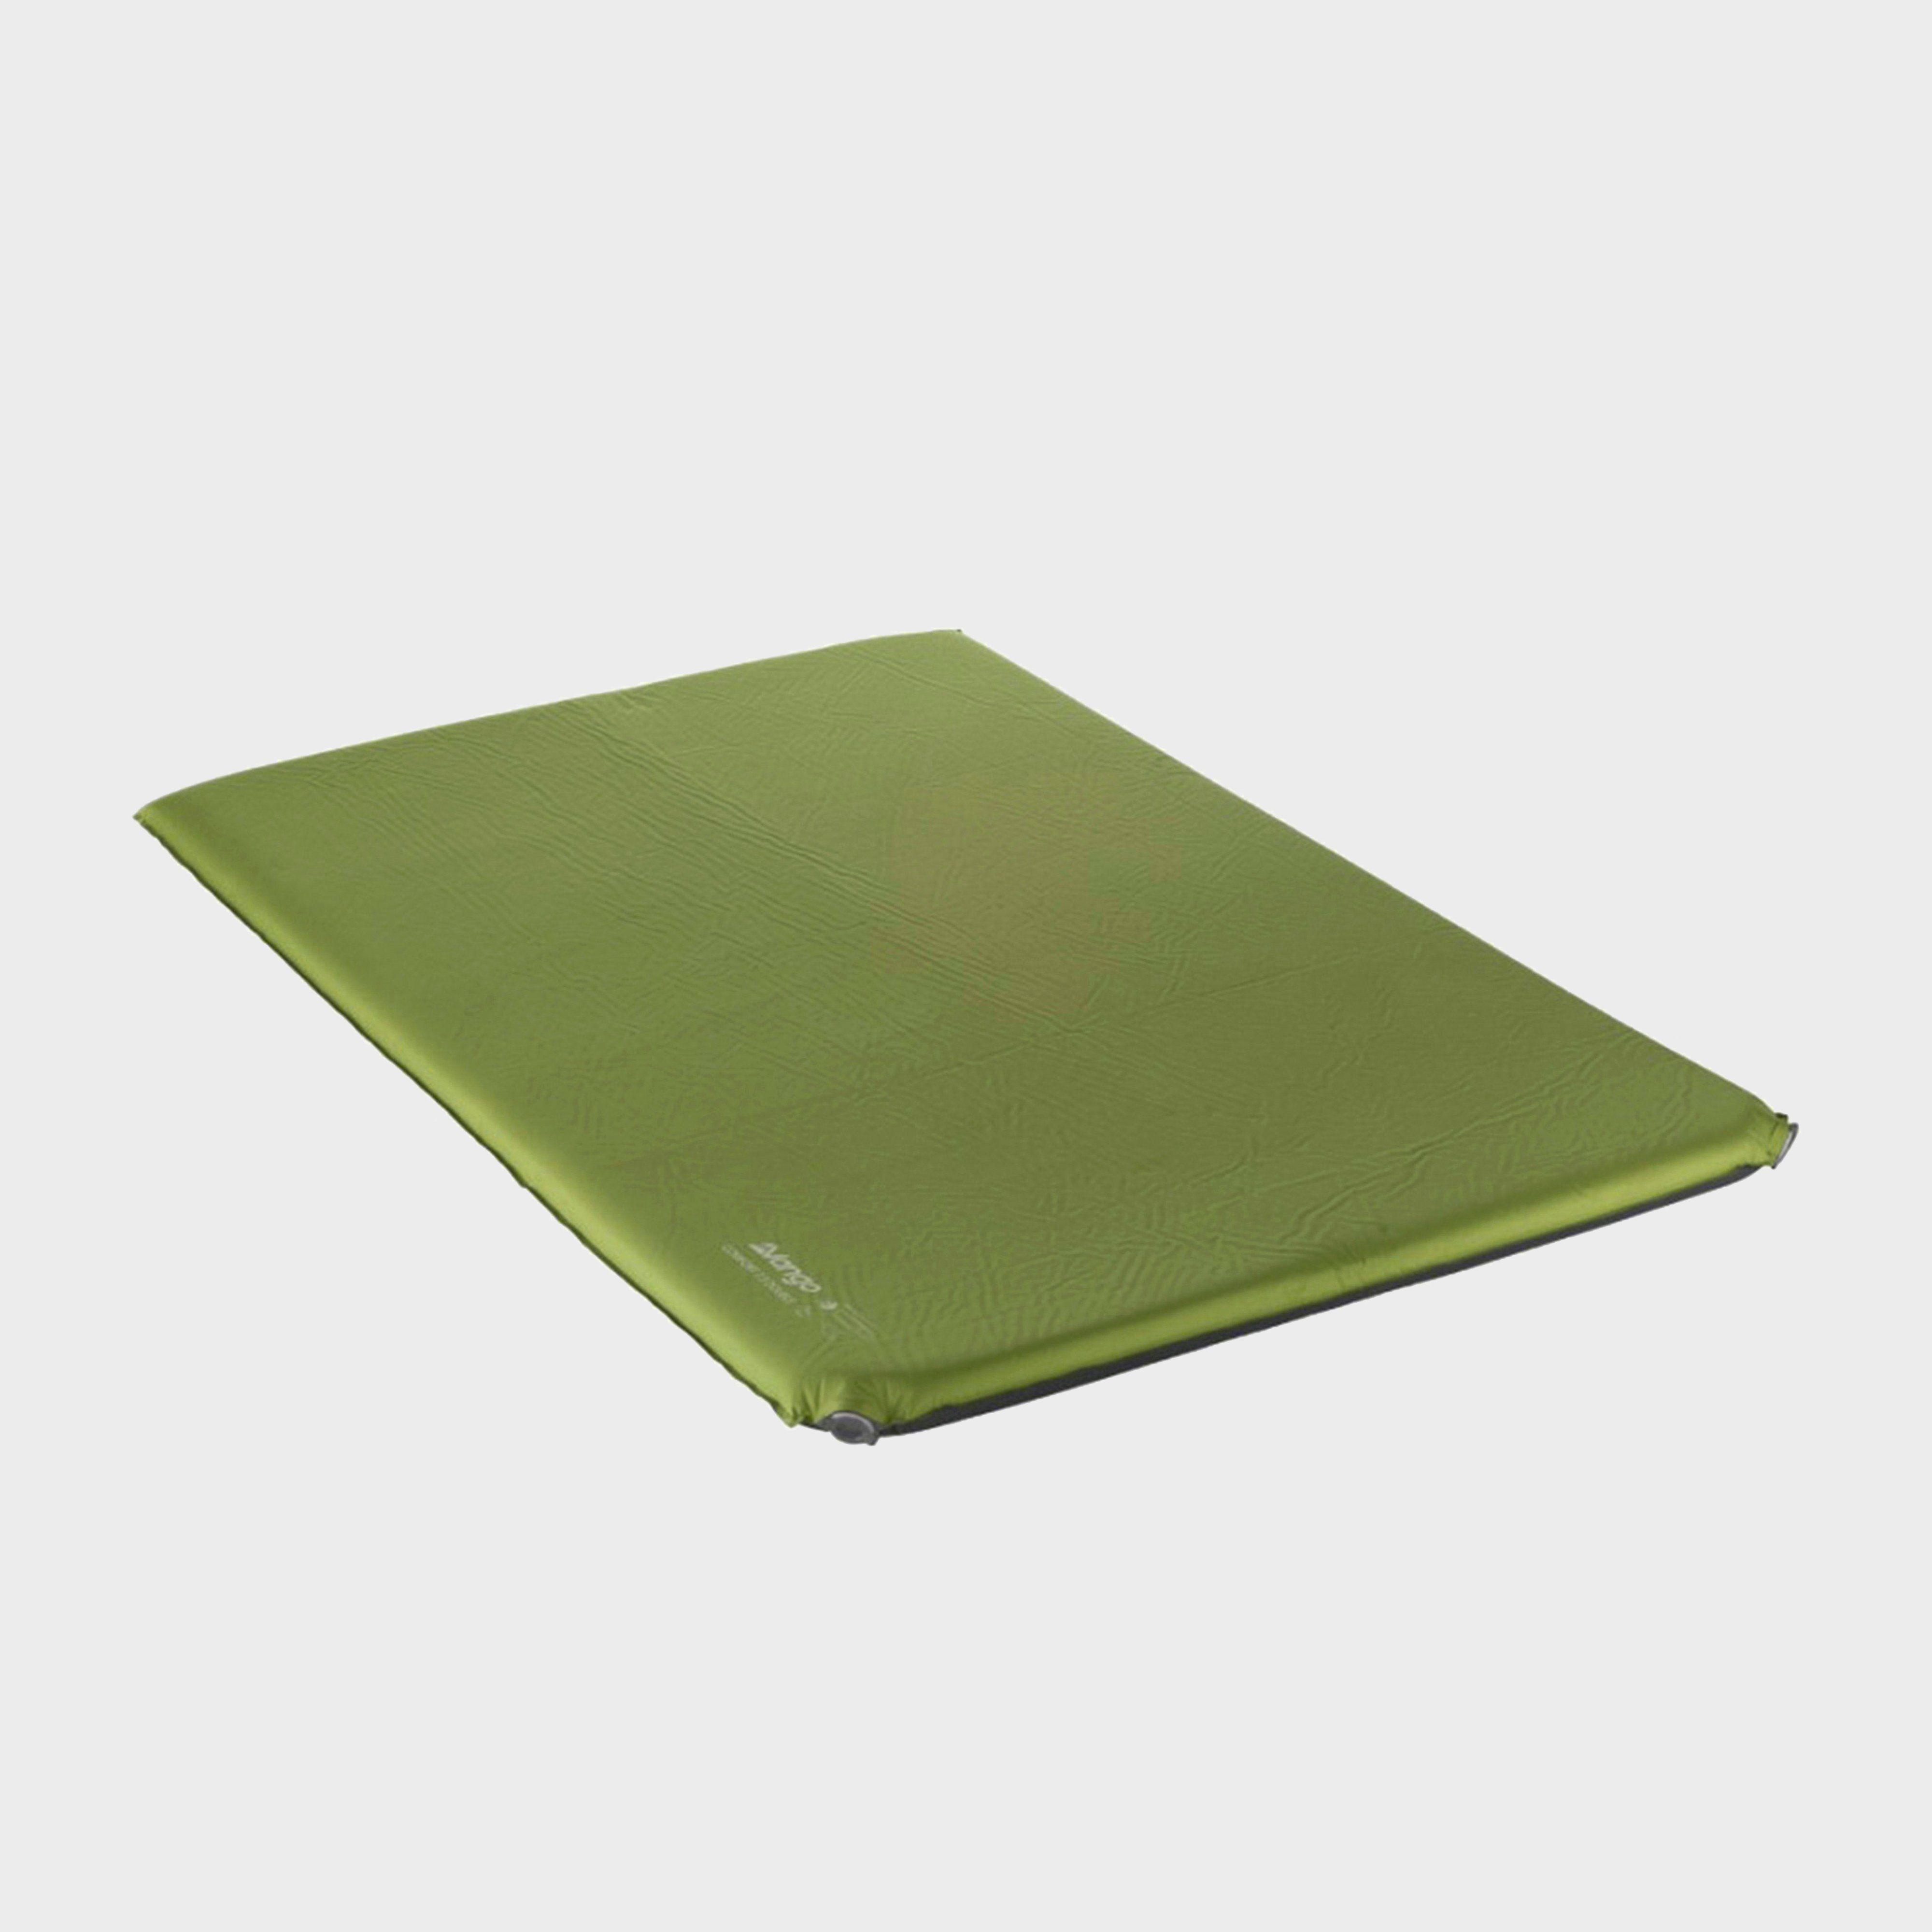 VANGO Comfort 7.5 Double Sleeping Mat